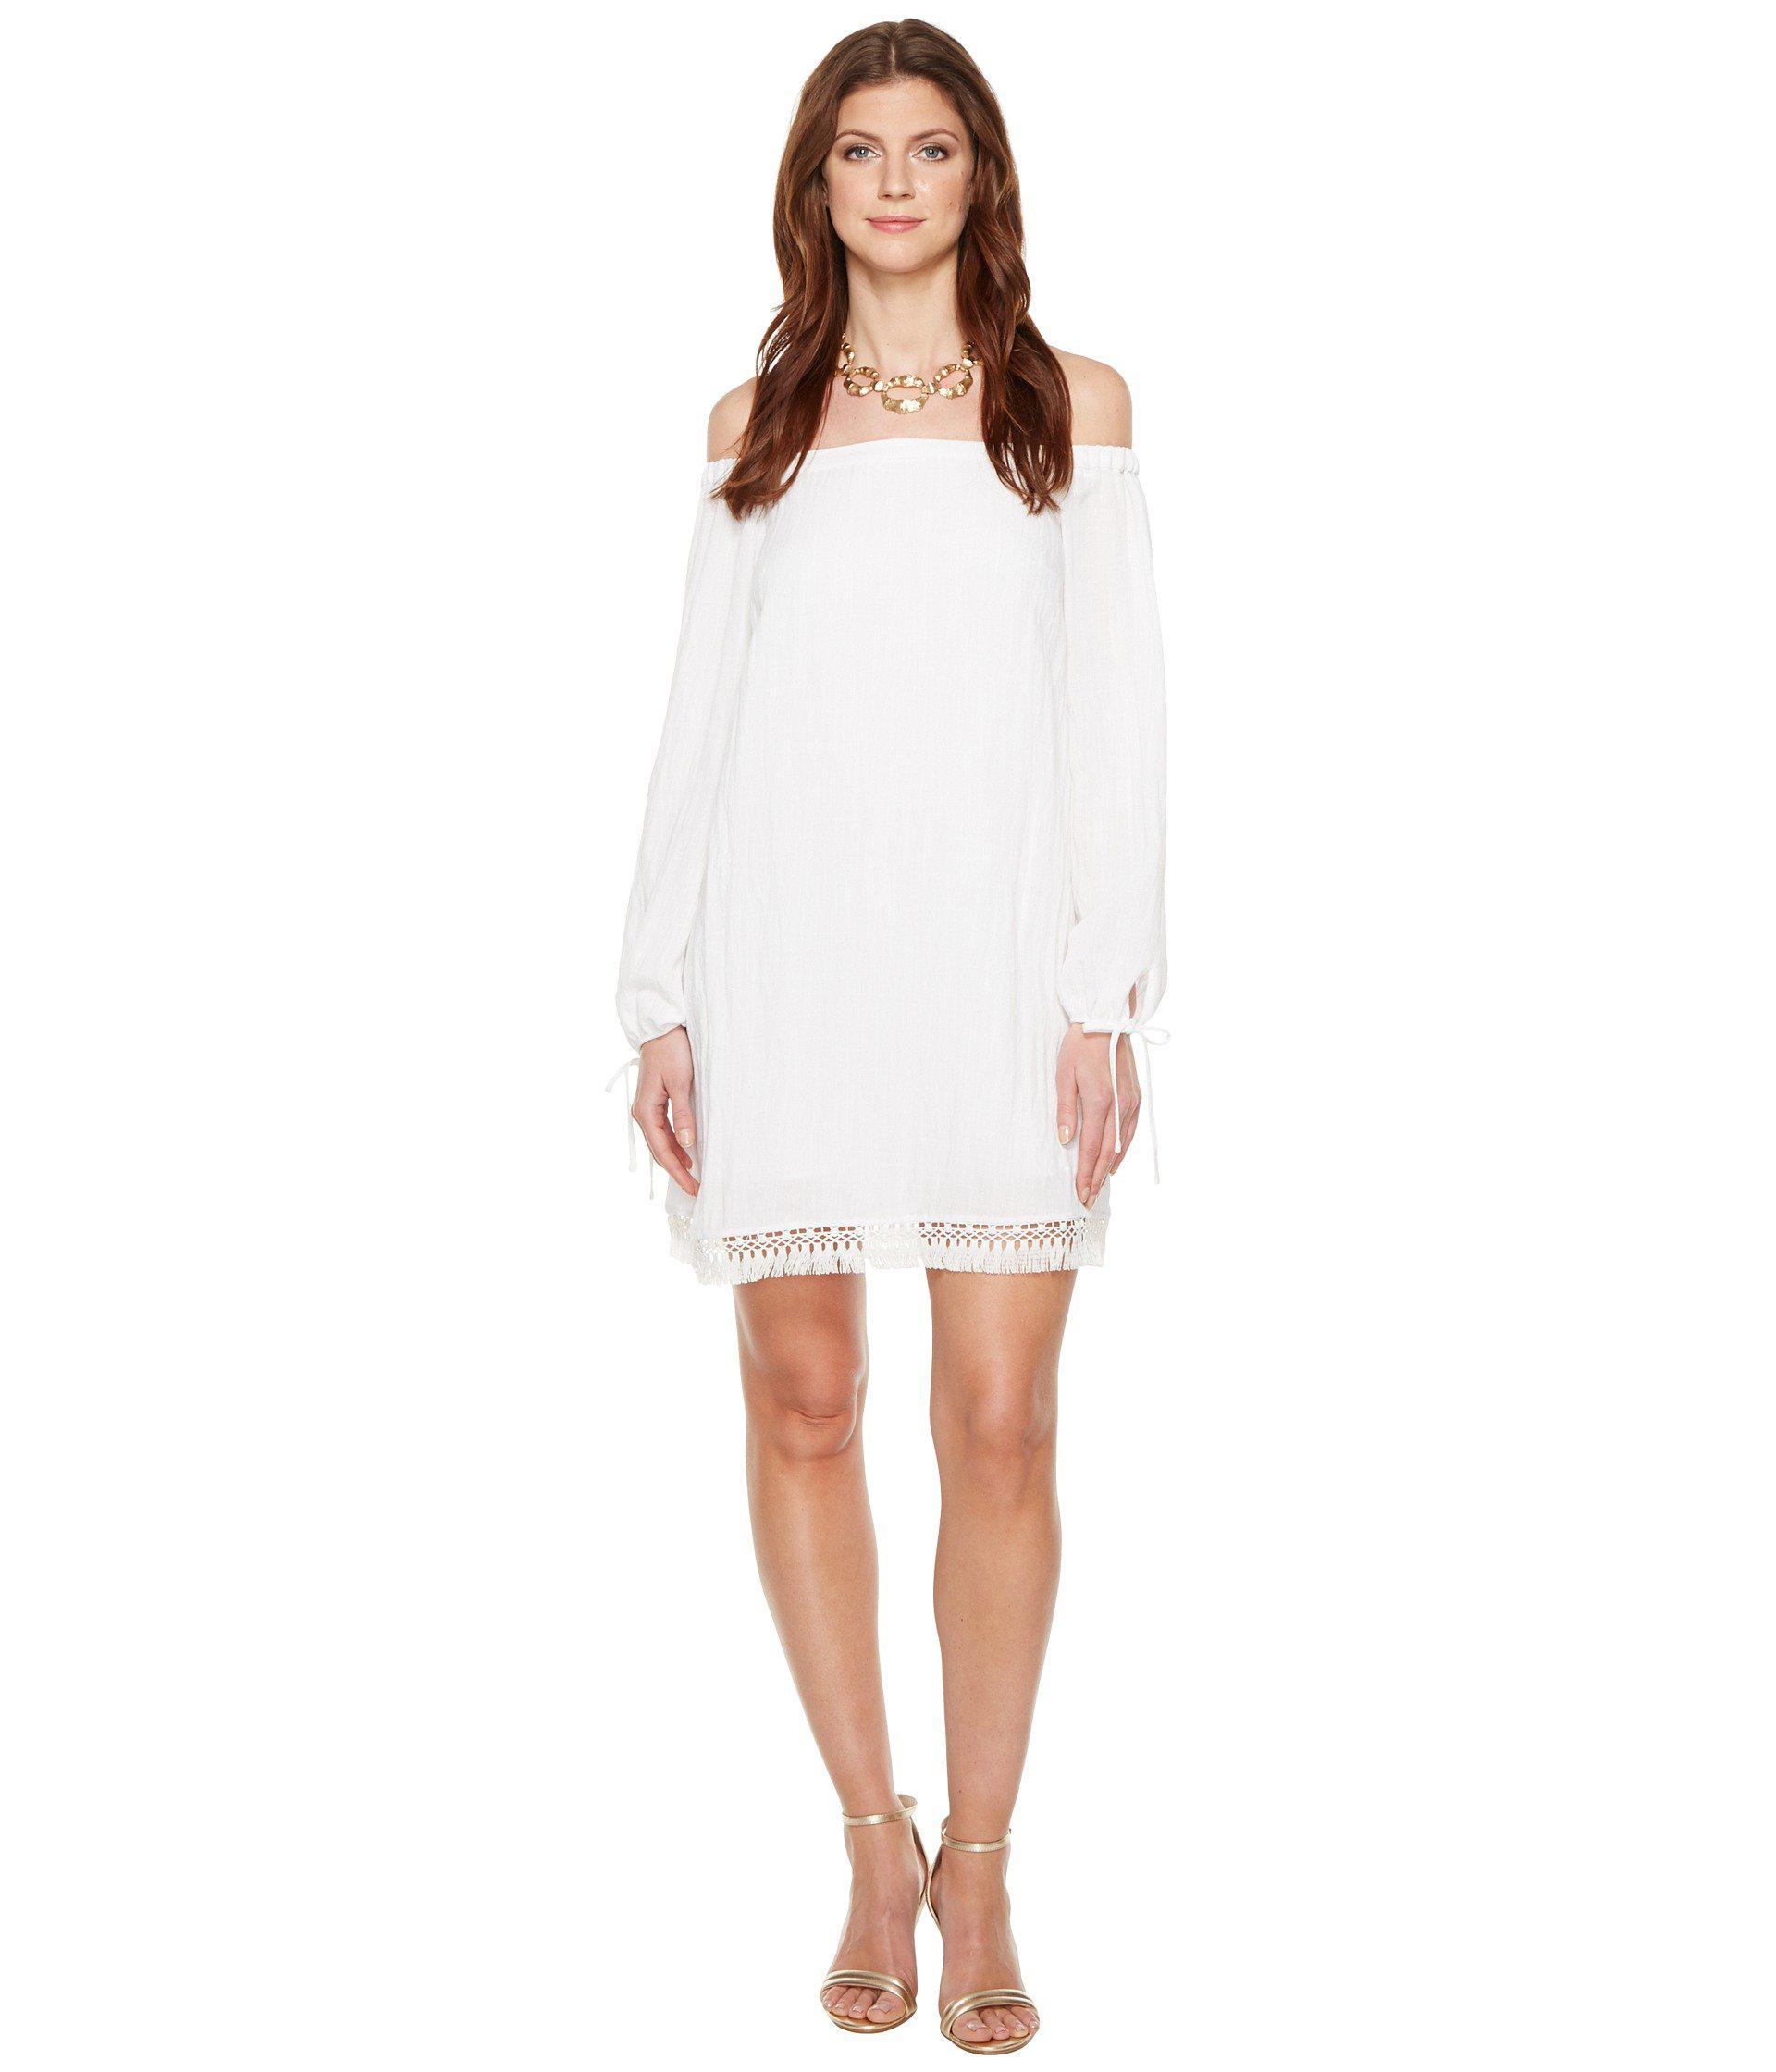 1460f9e7097d94 Lilly Pulitzer Adira Dress in White - Lyst